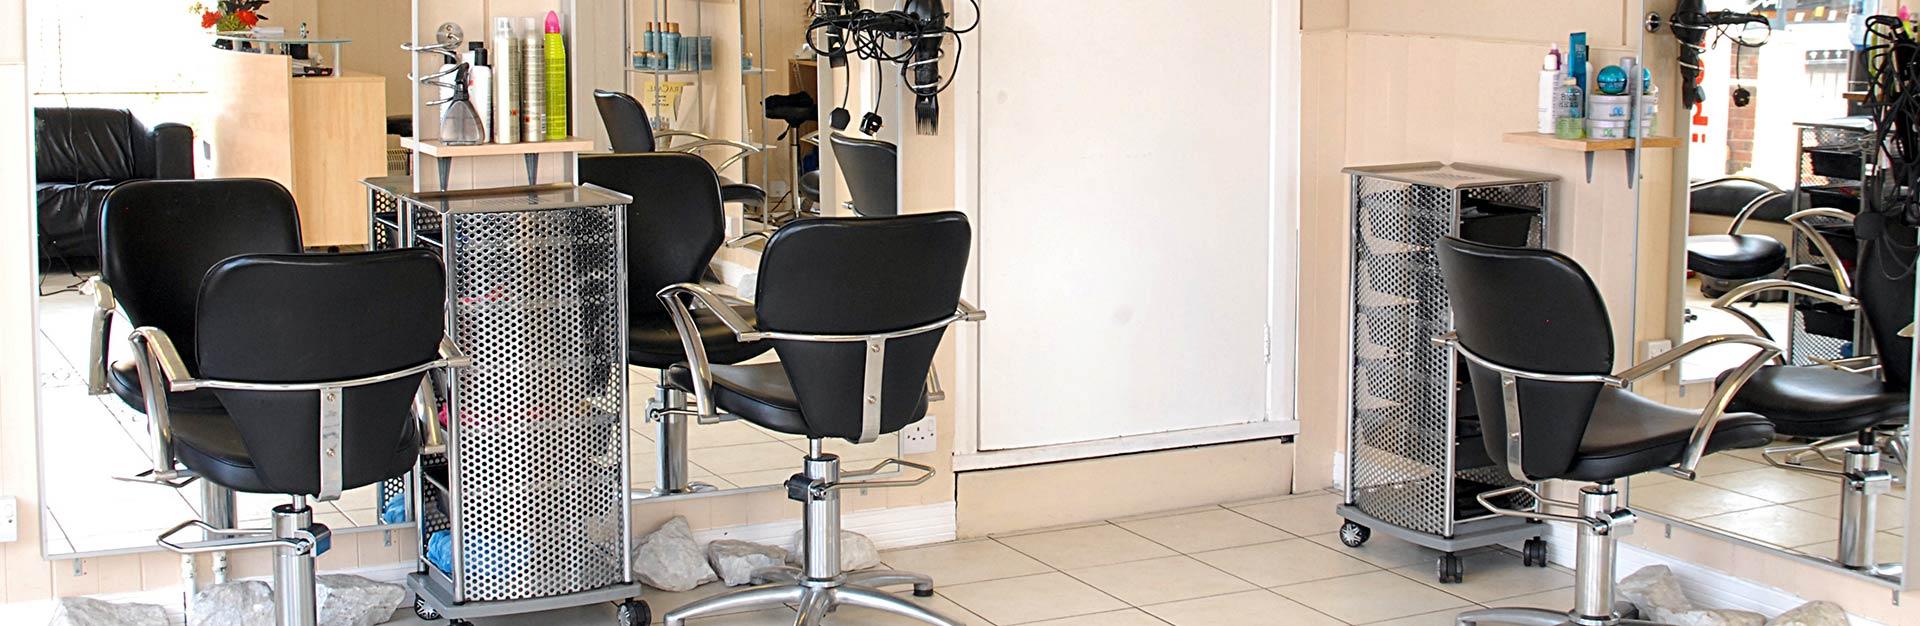 Friseur-Salon-Kamera-Videoueberwachung-Enthaarung-Waxing-OrangeComputer-header_